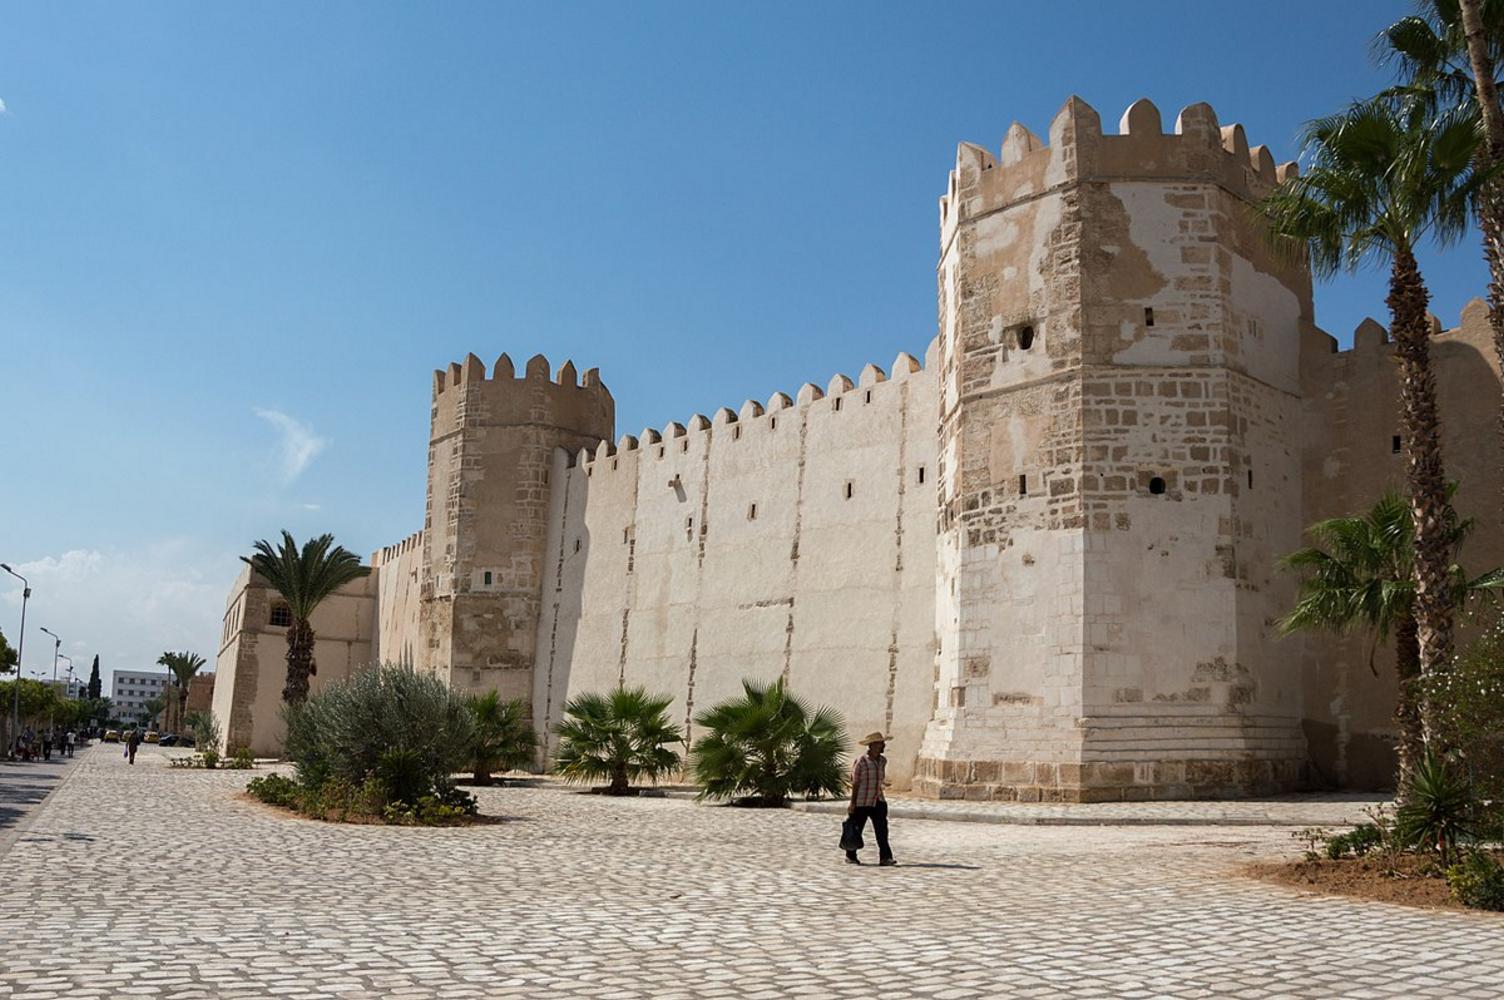 Sfax Medina Walls, Tunisia